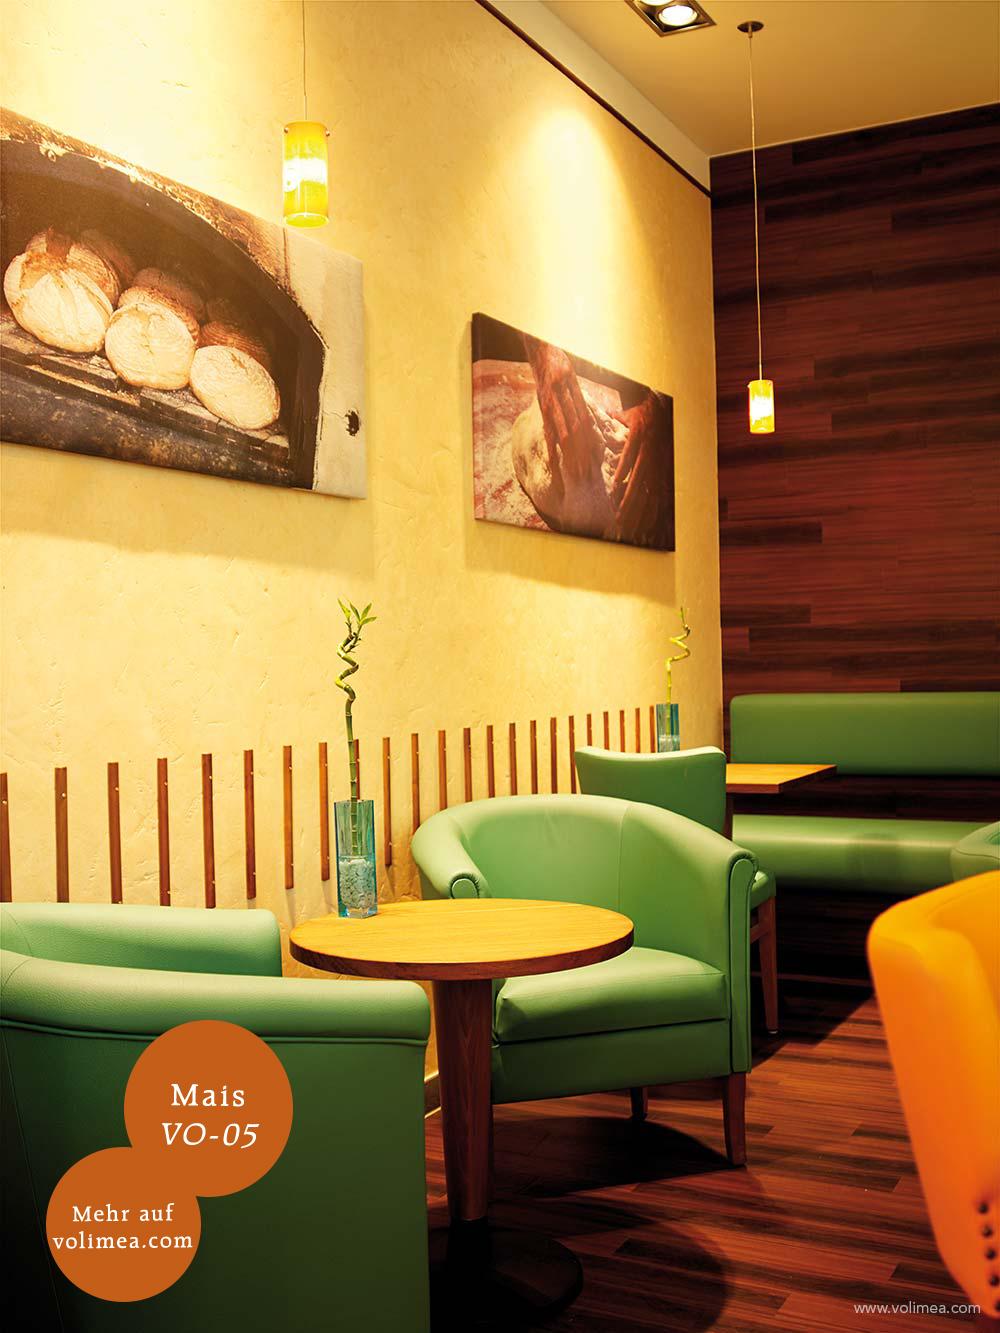 Mikrozement fugenlose Volimea Wandbeschichtung in einem Cafe - Mais VO-05